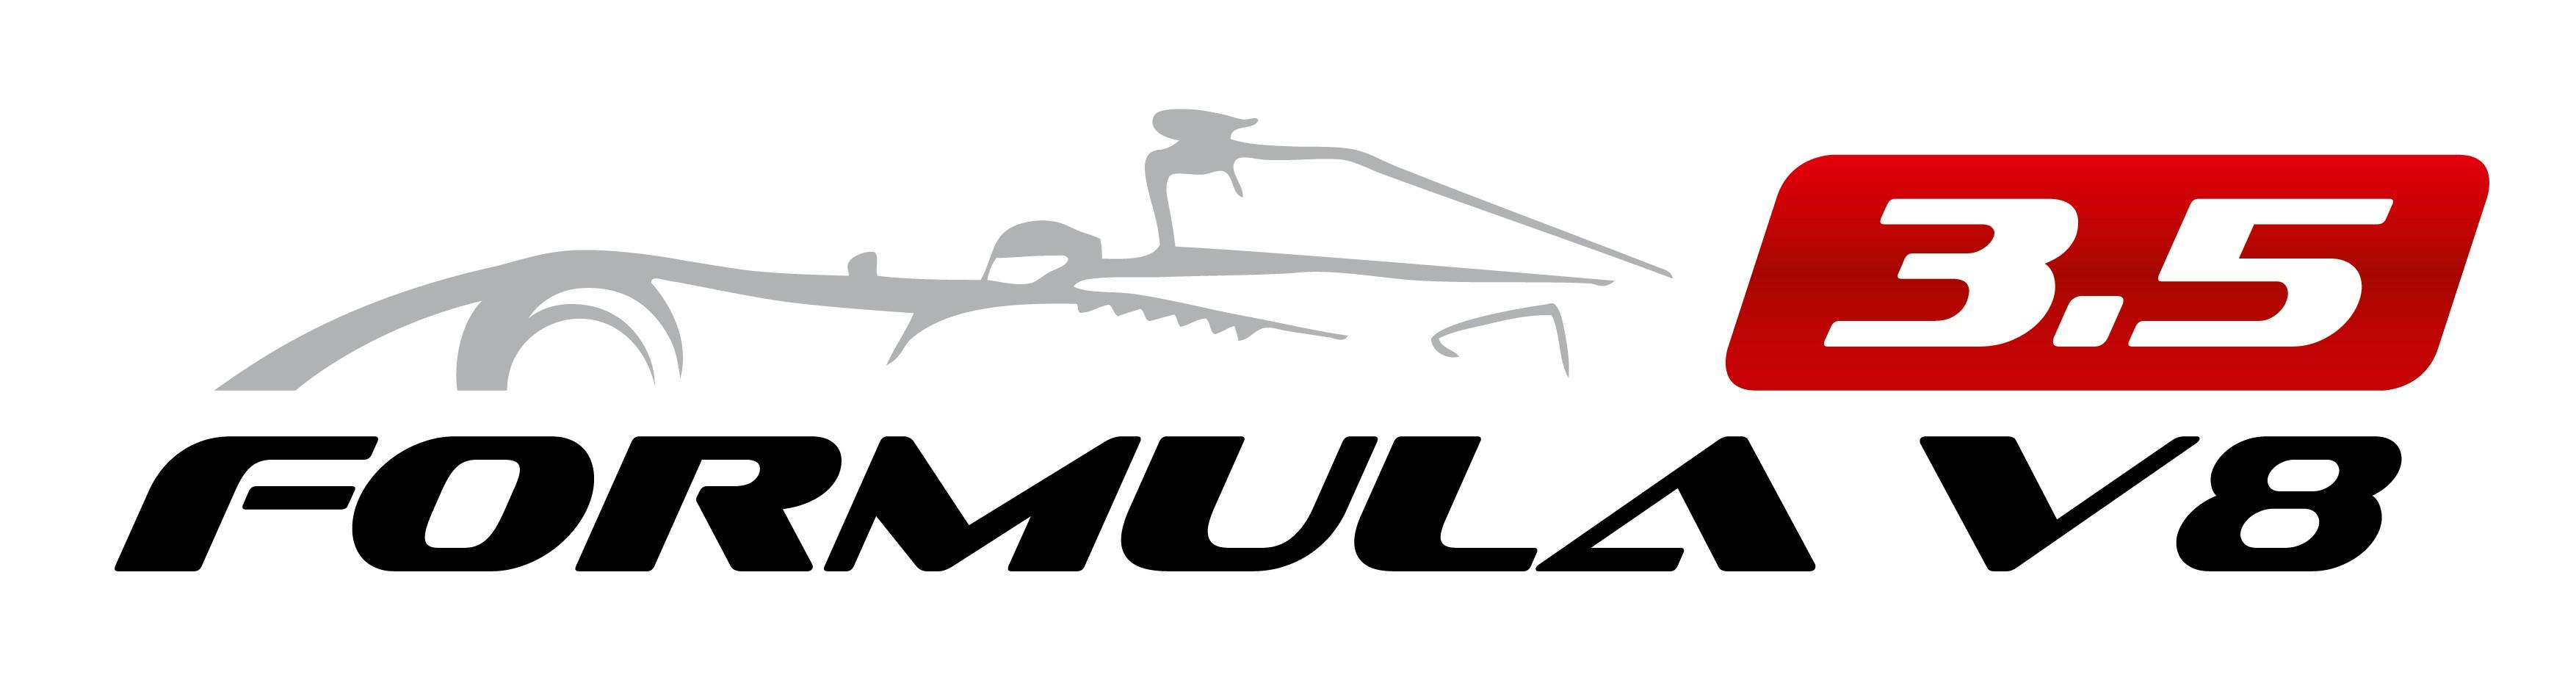 Logo Formula Renault 3.5